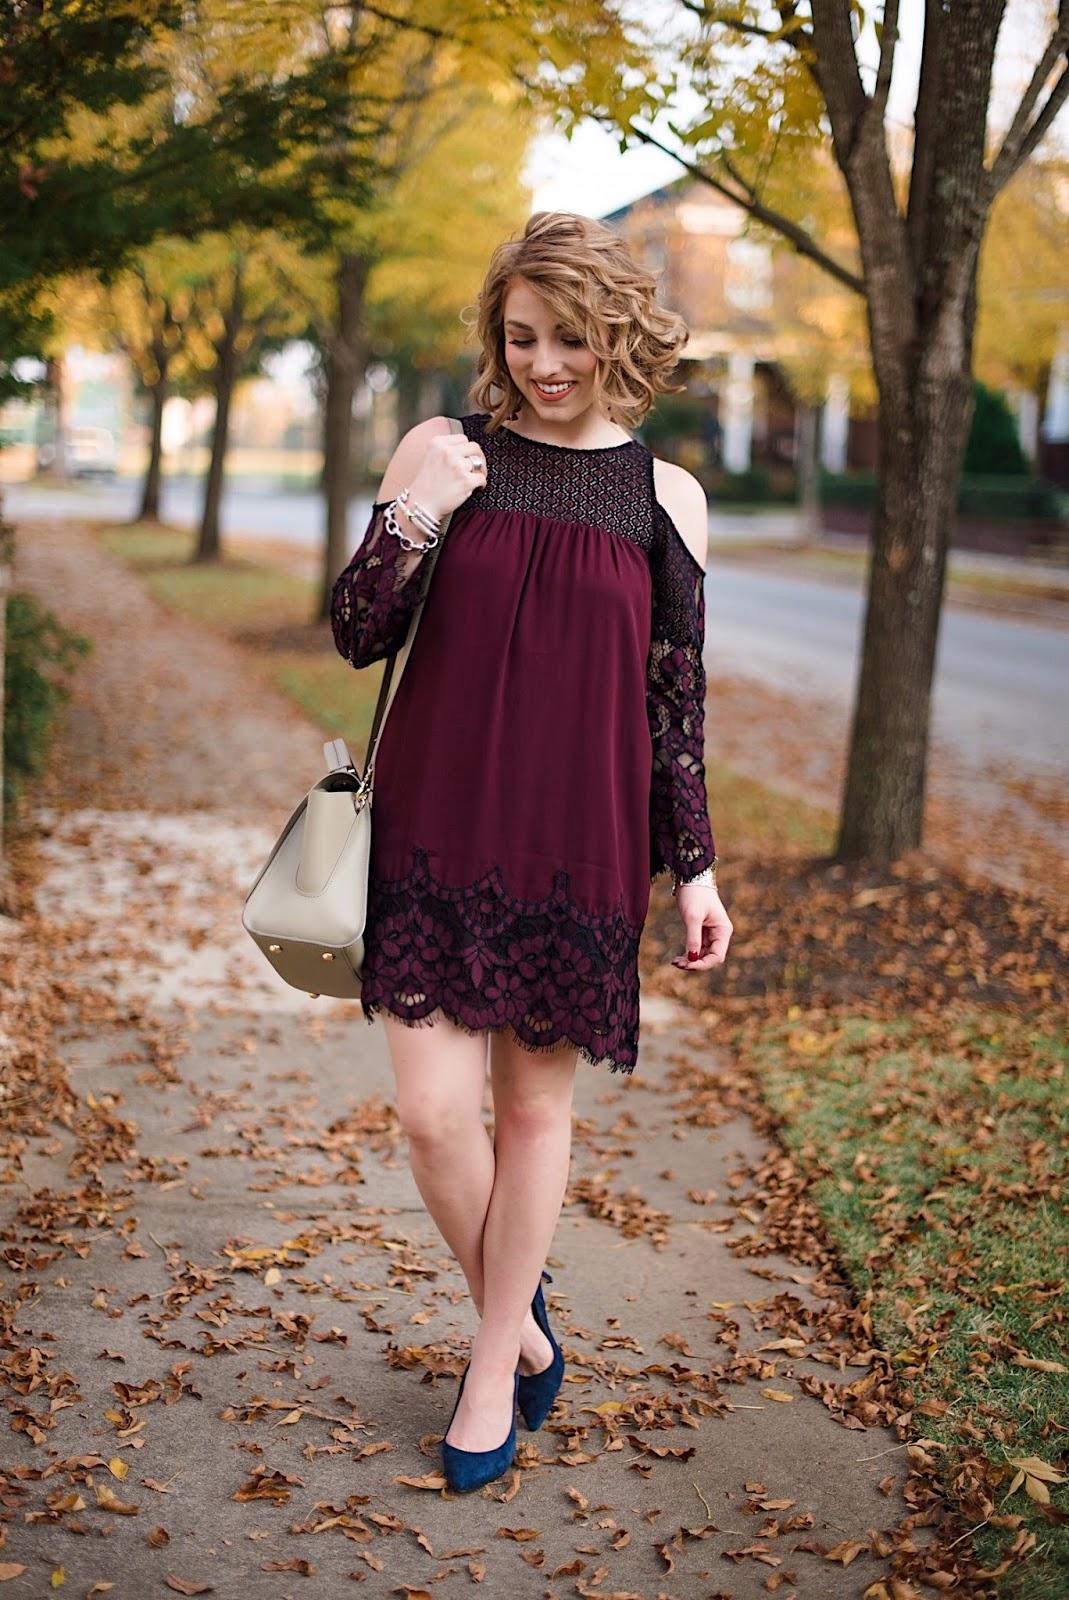 Two Tone Lace Dress (Fall Fashion) - Something Delightful Blog